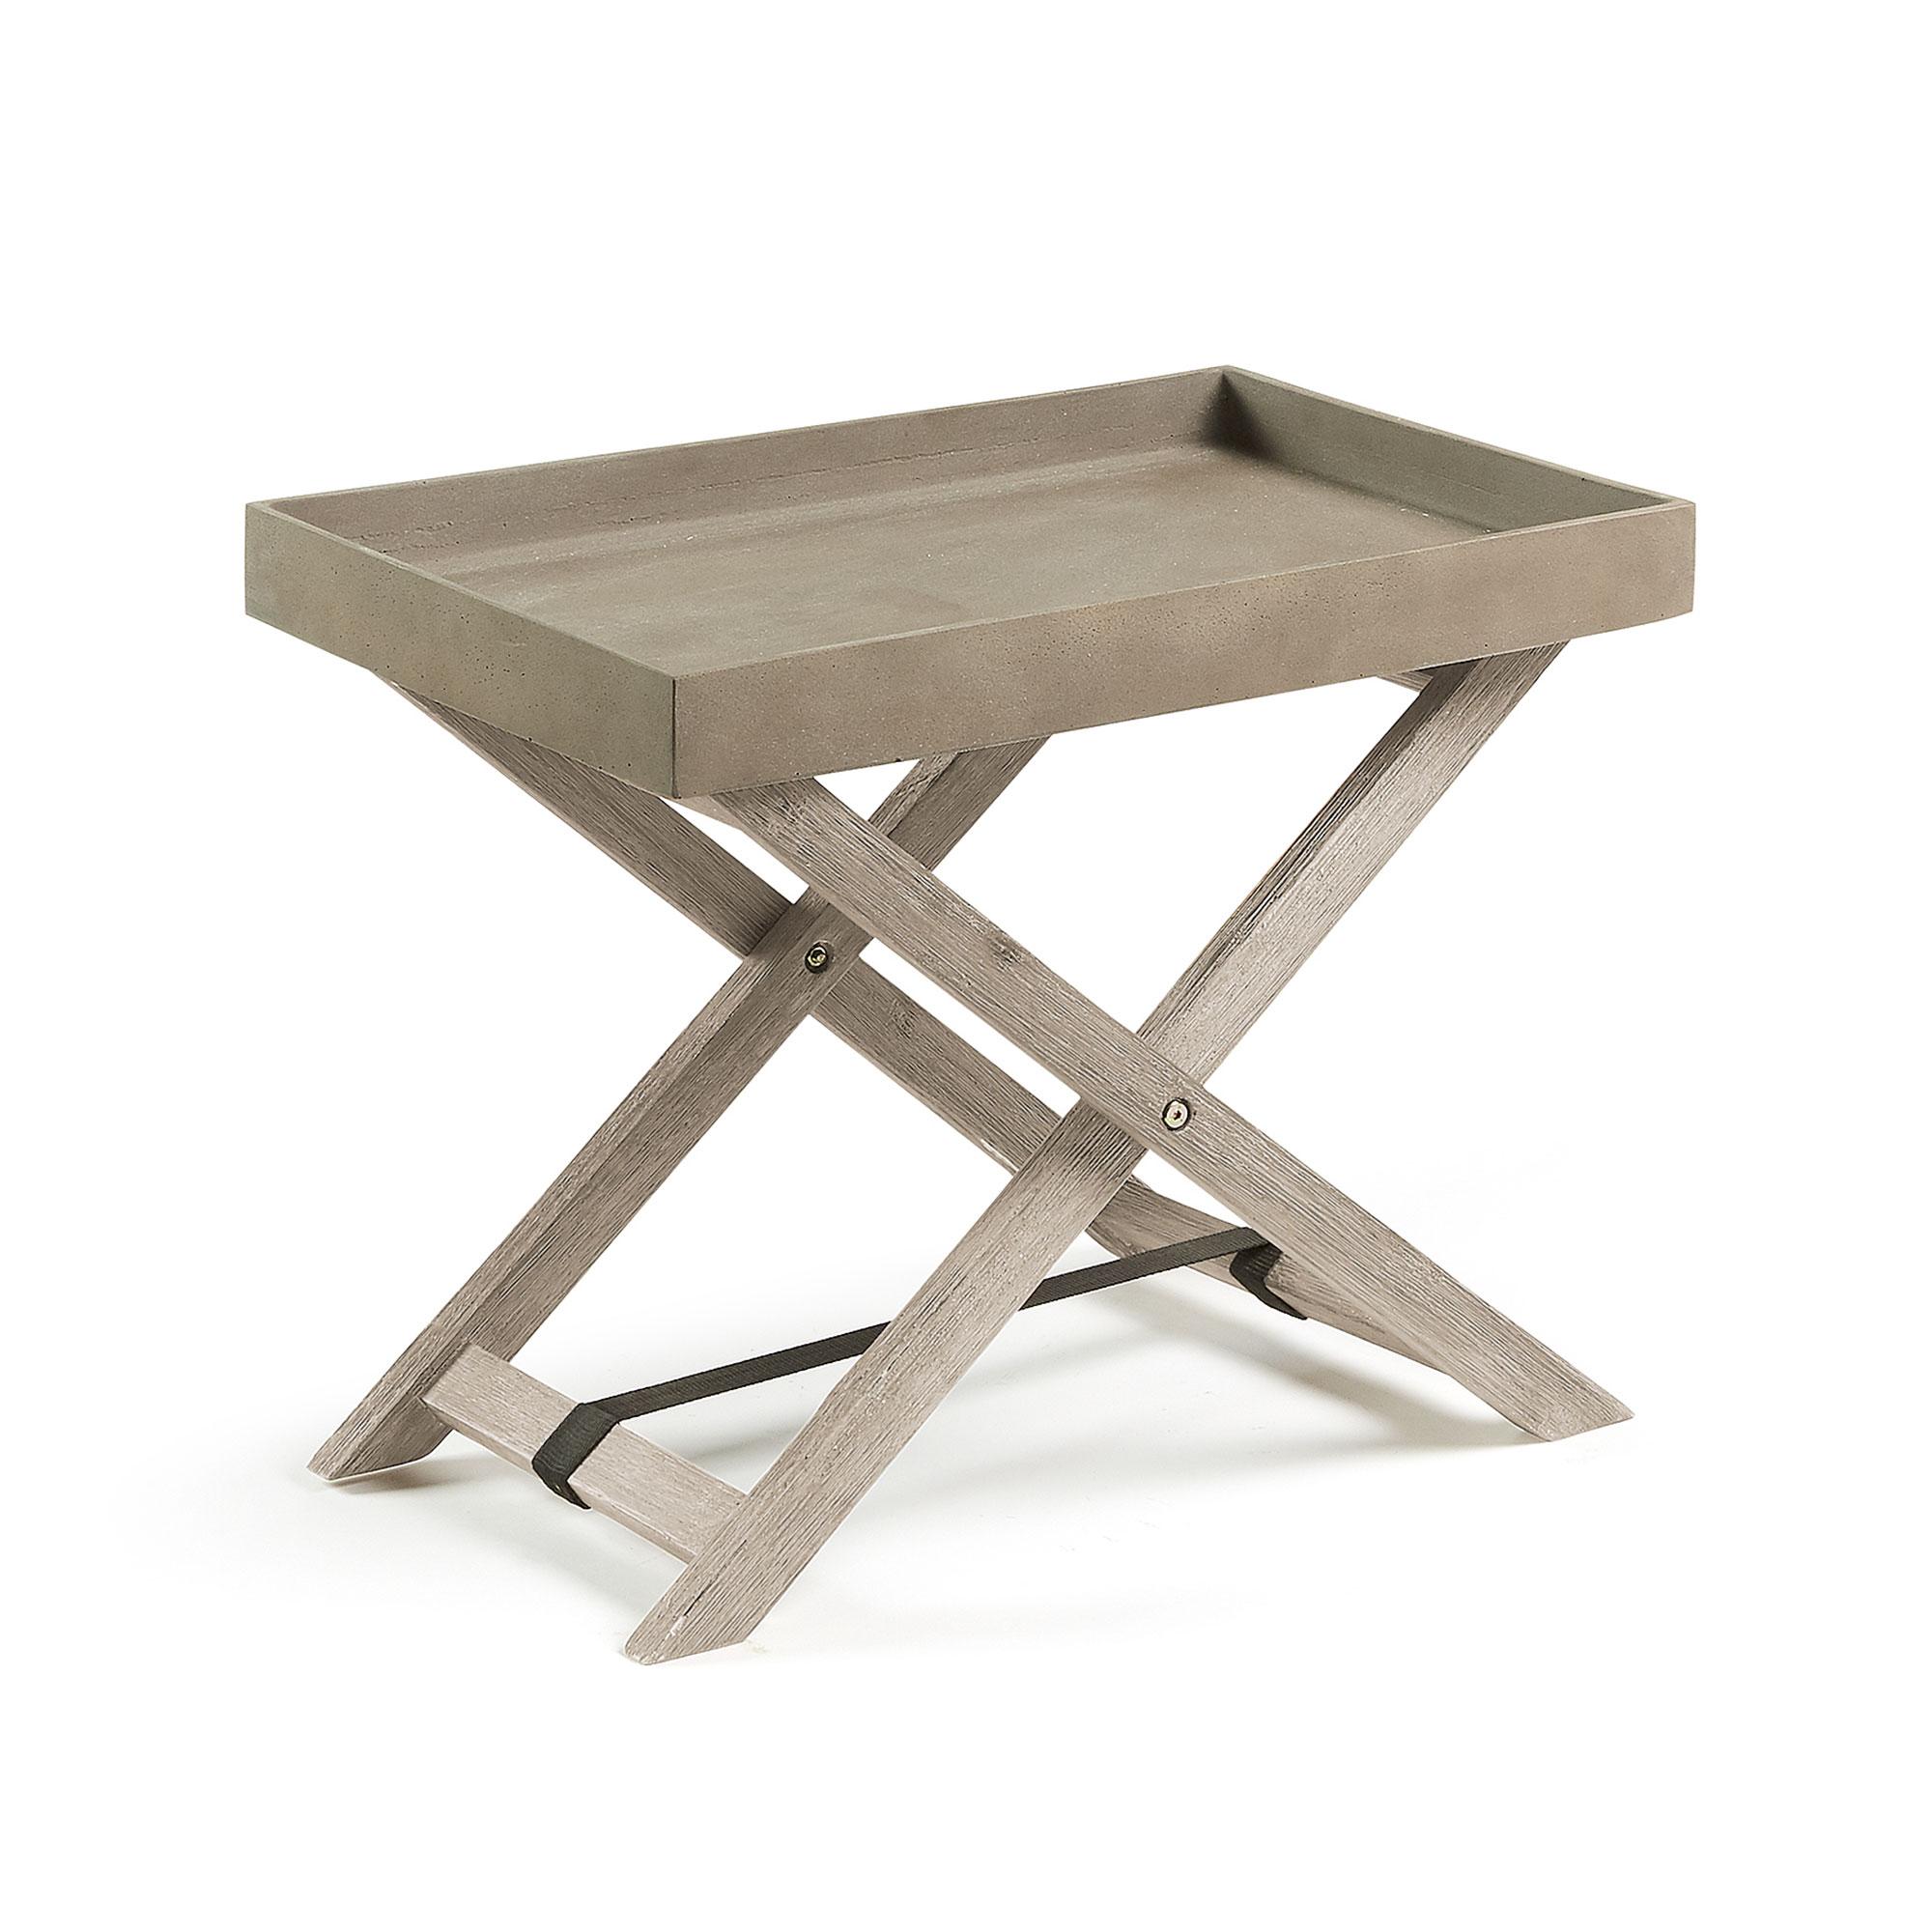 laforma – Laforma stahl bakkebord - rustbrun/natur cement/akacietræ (55x35) fra boboonline.dk